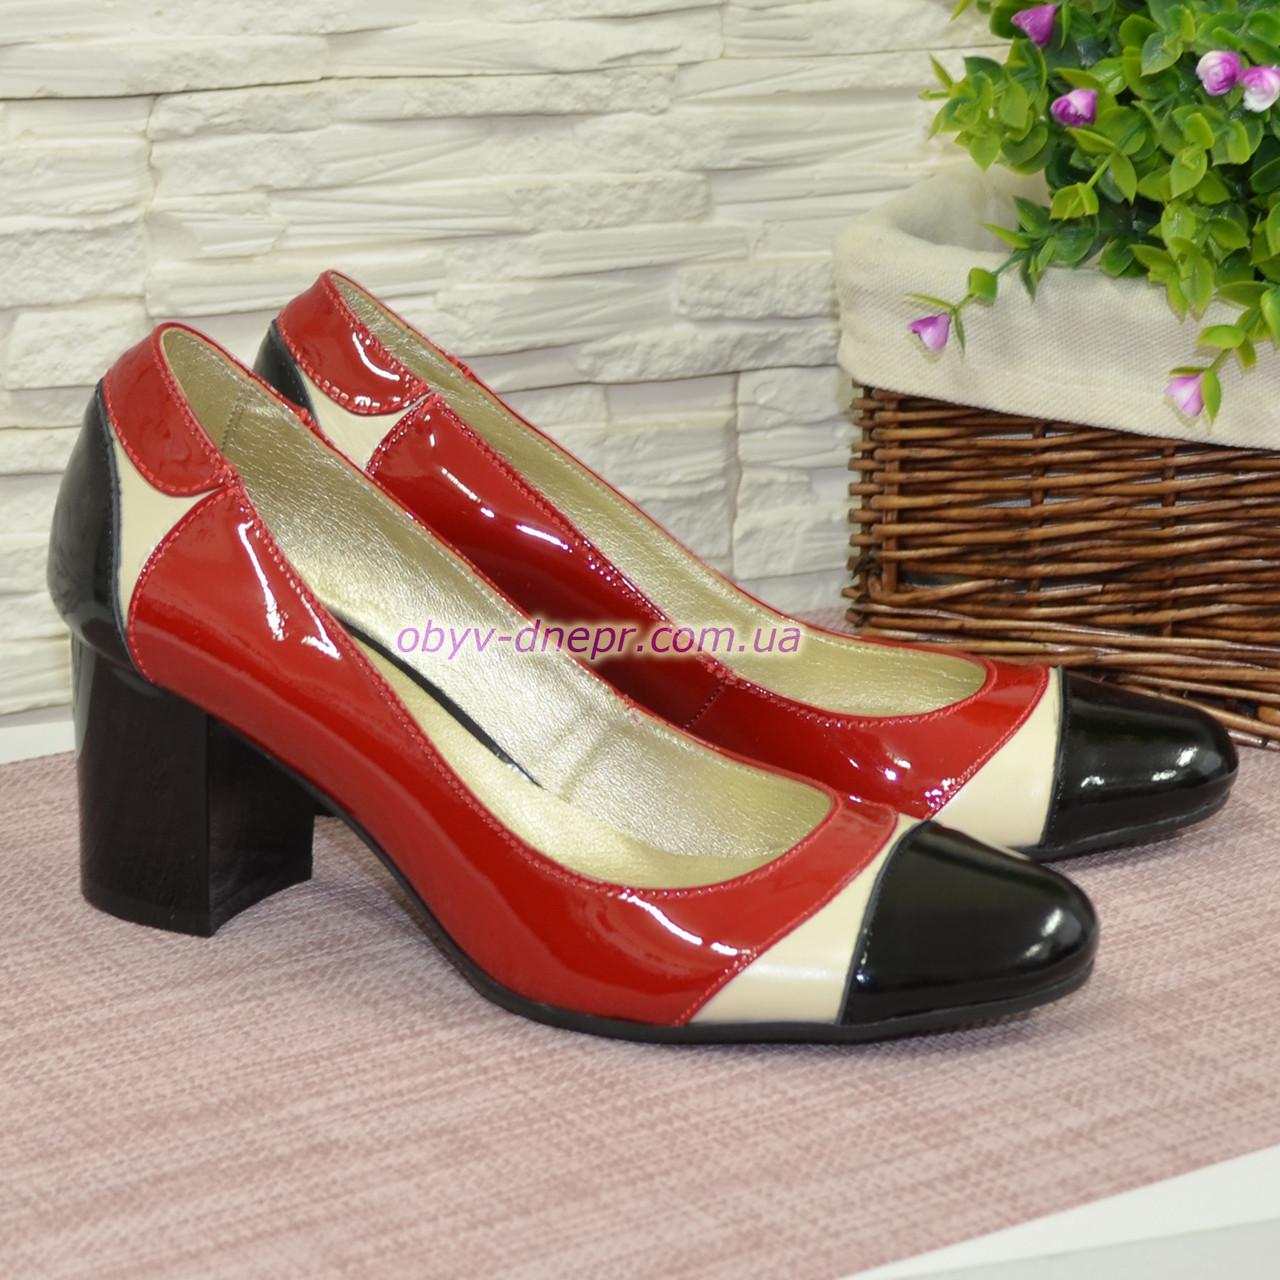 Женские кожаные туфли-лодочки на устойчивом каблуке